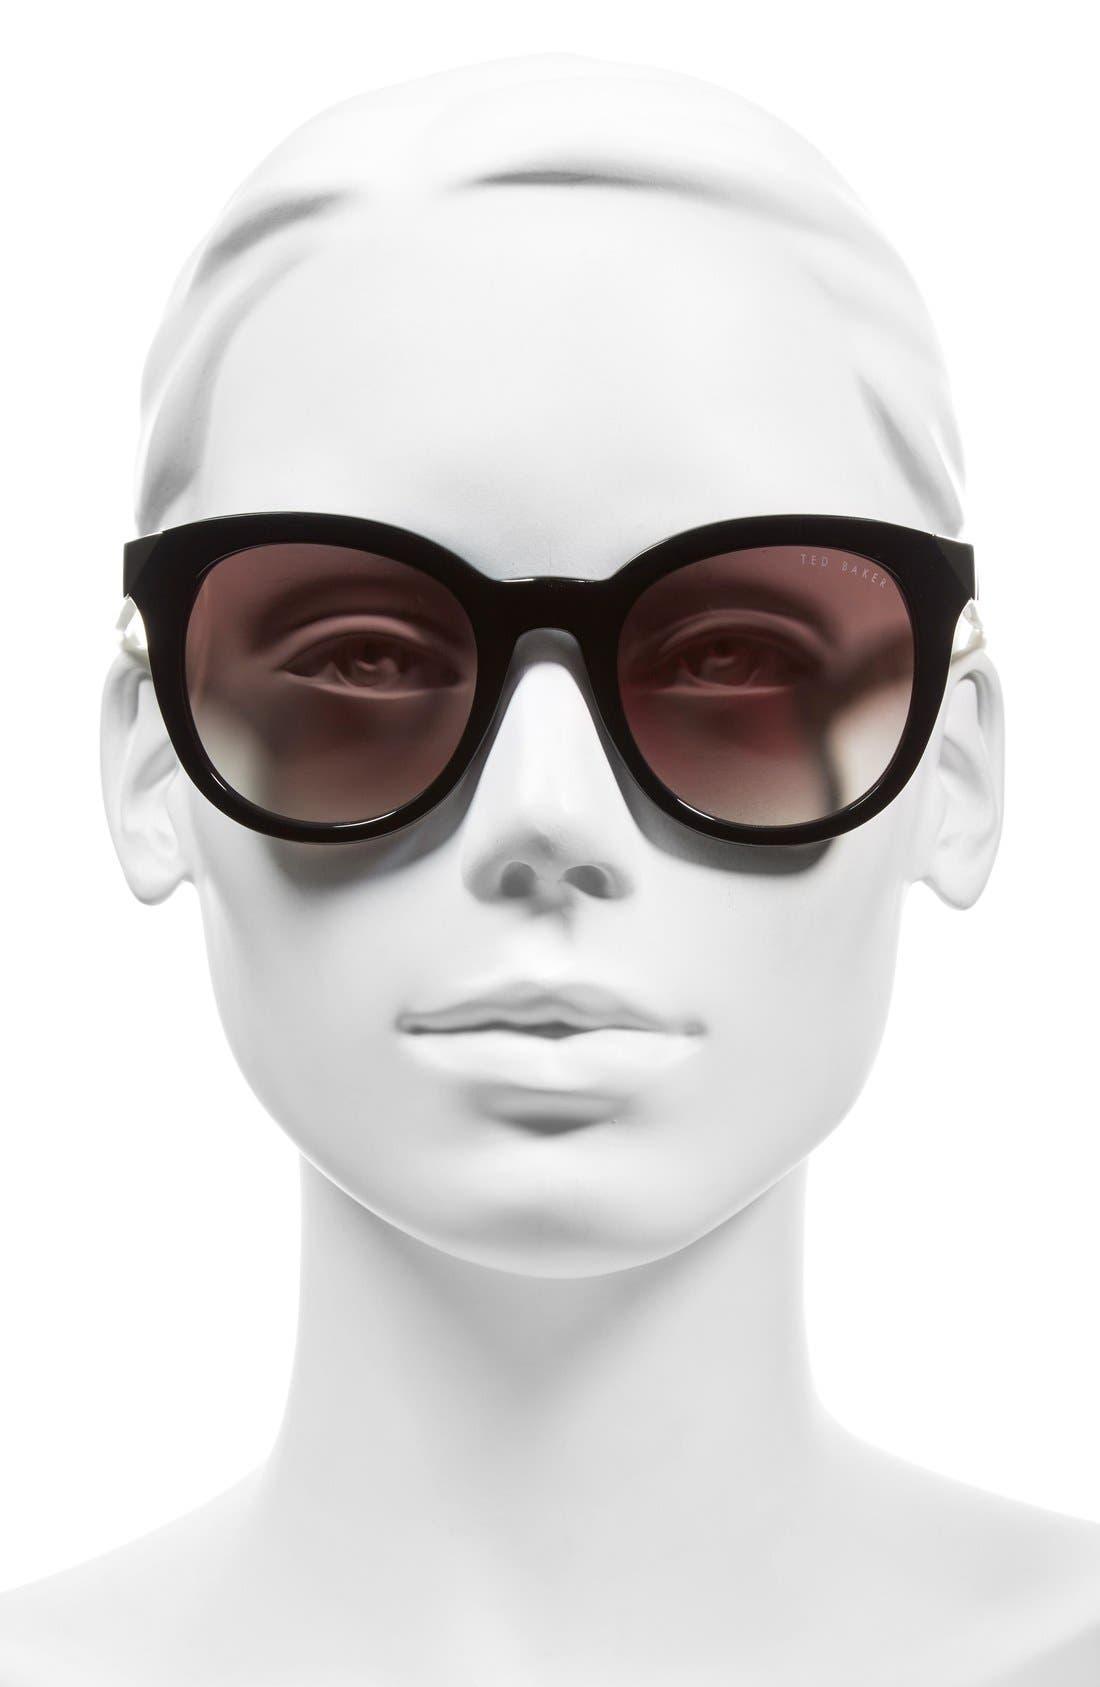 52mm Metal Accent Sunglasses,                             Alternate thumbnail 3, color,